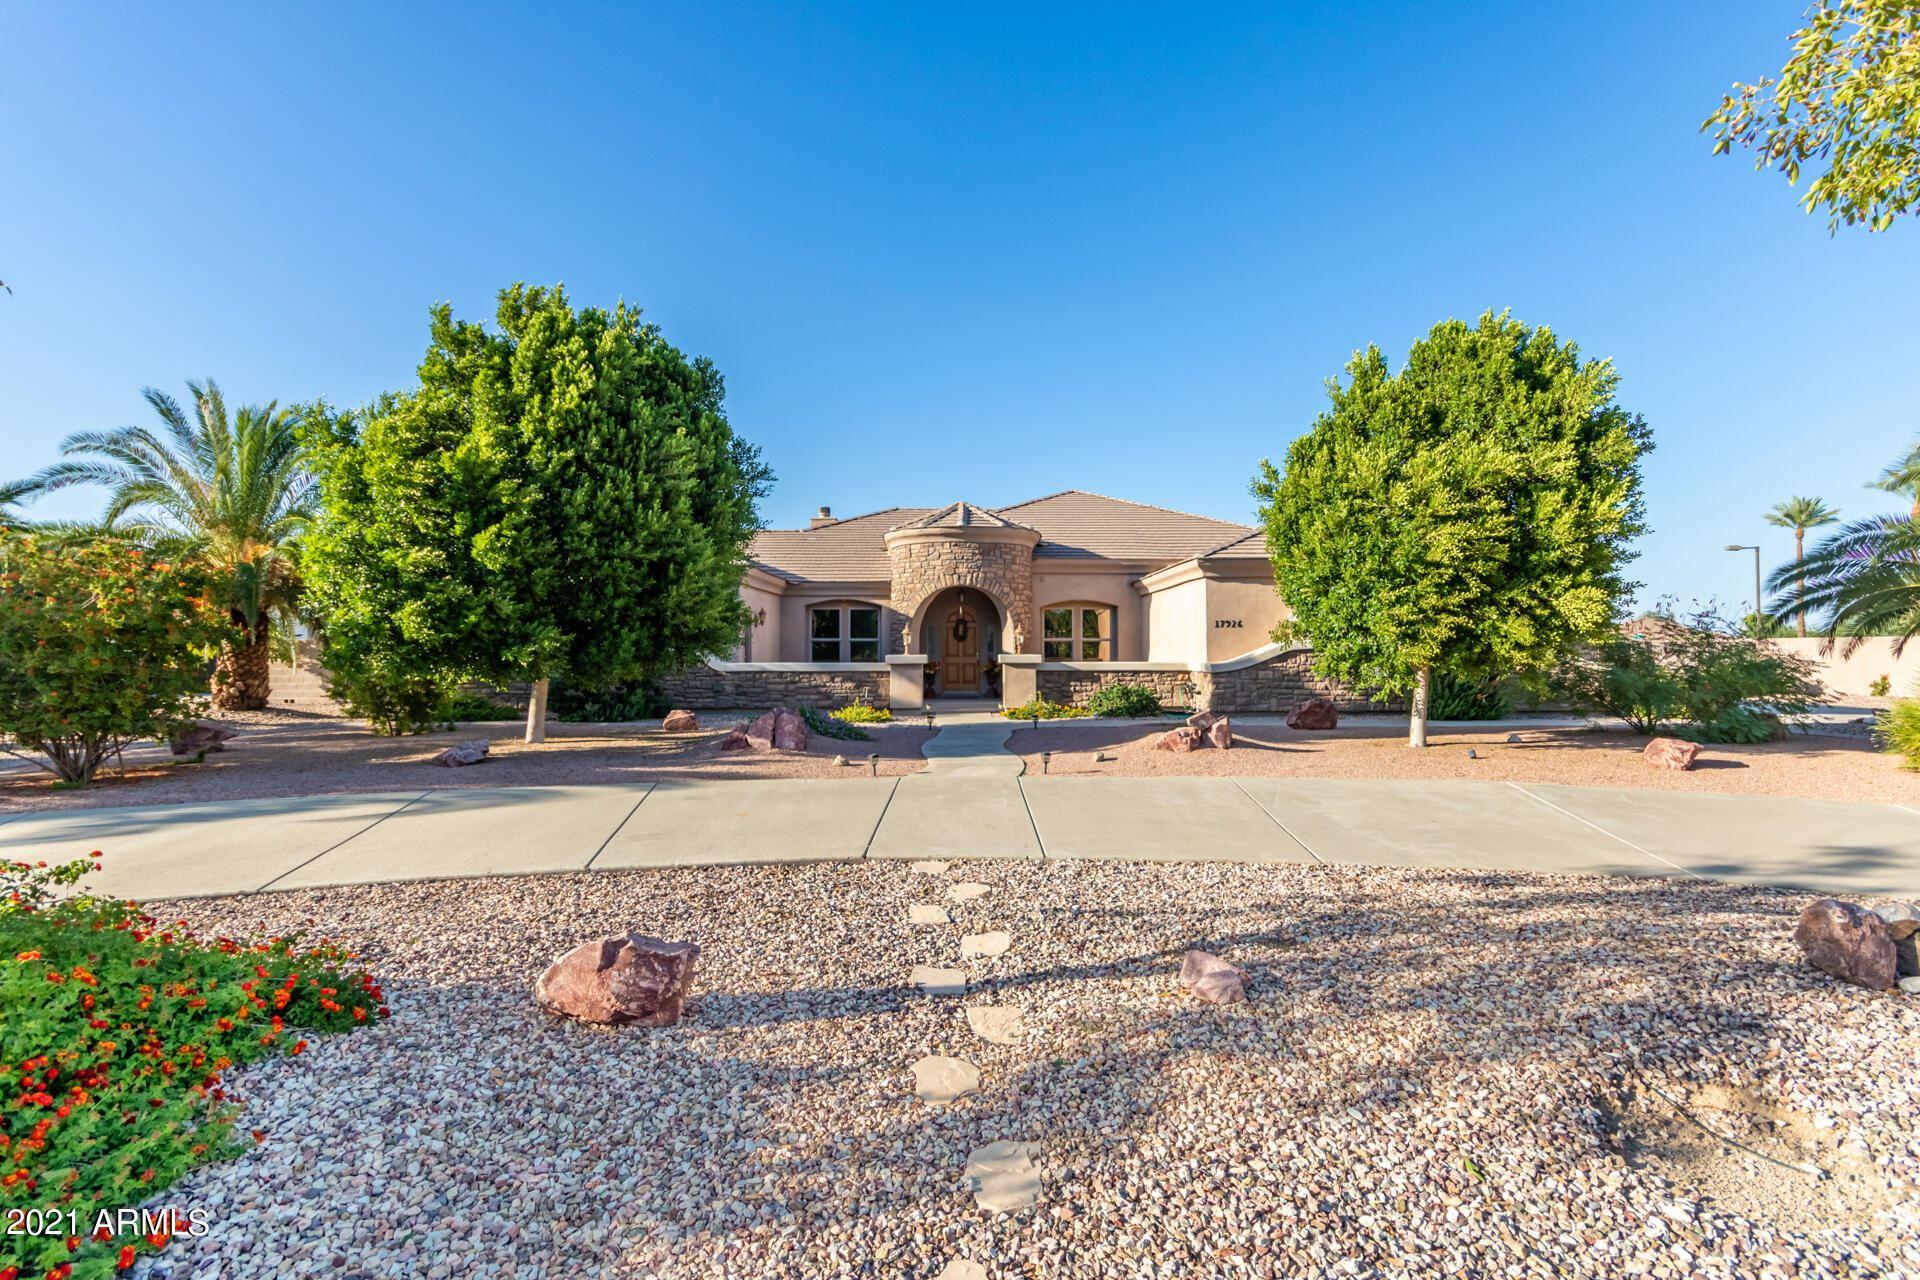 Photo of 17926 W Denton Avenue, Litchfield Park, AZ 85340 (MLS # 6307421)